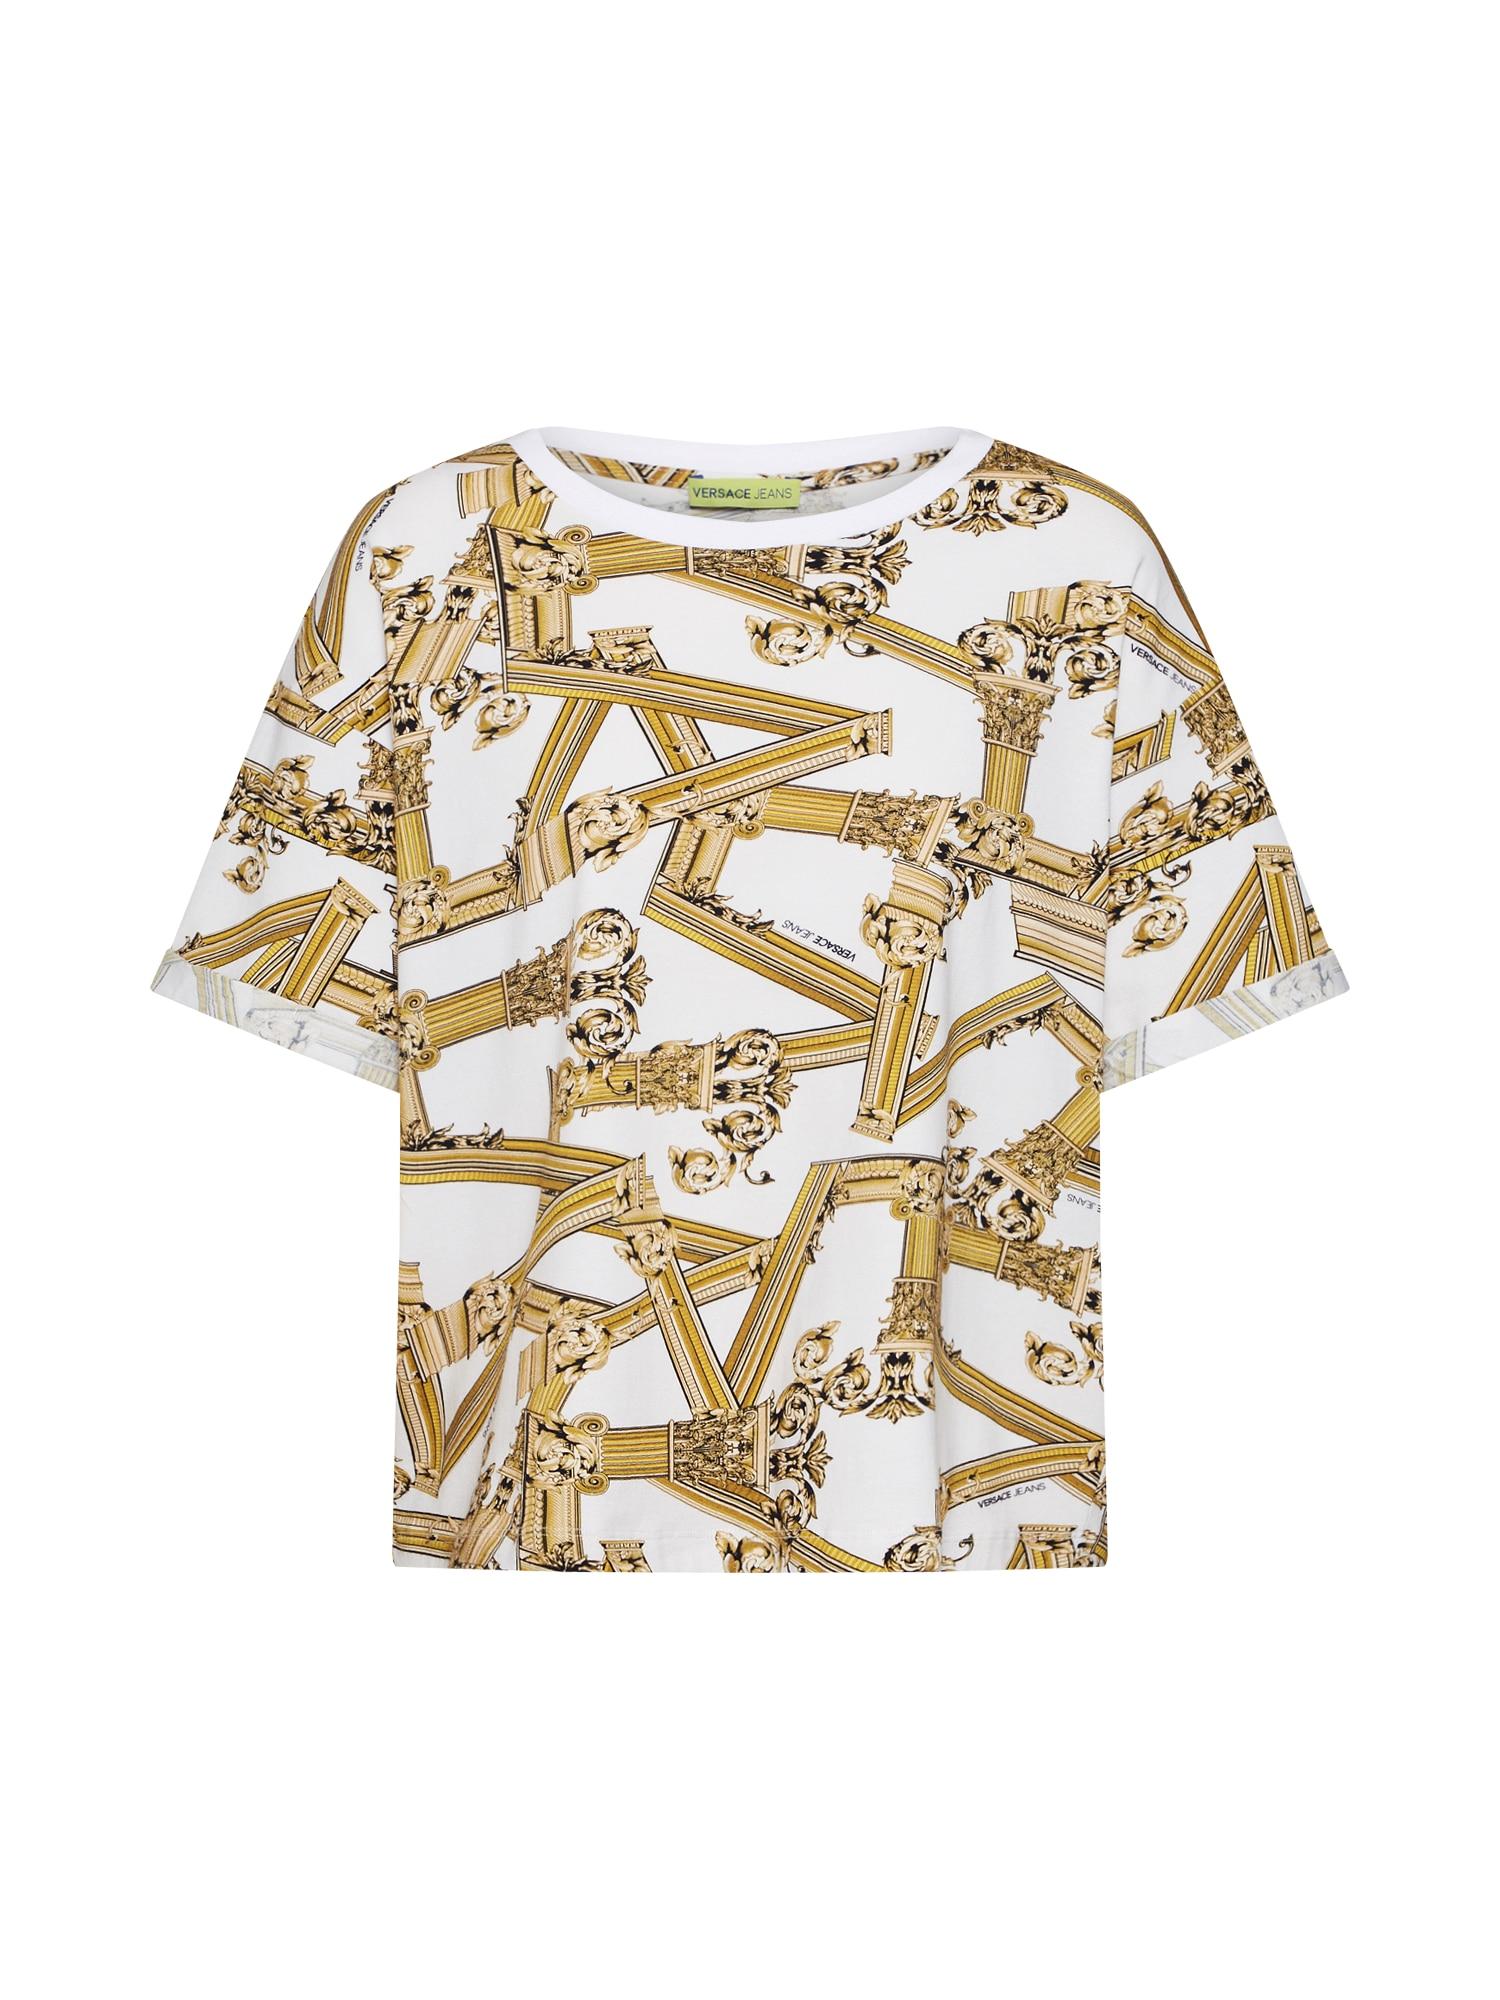 Tričko TDM606 zlatá bílá Versace Jeans